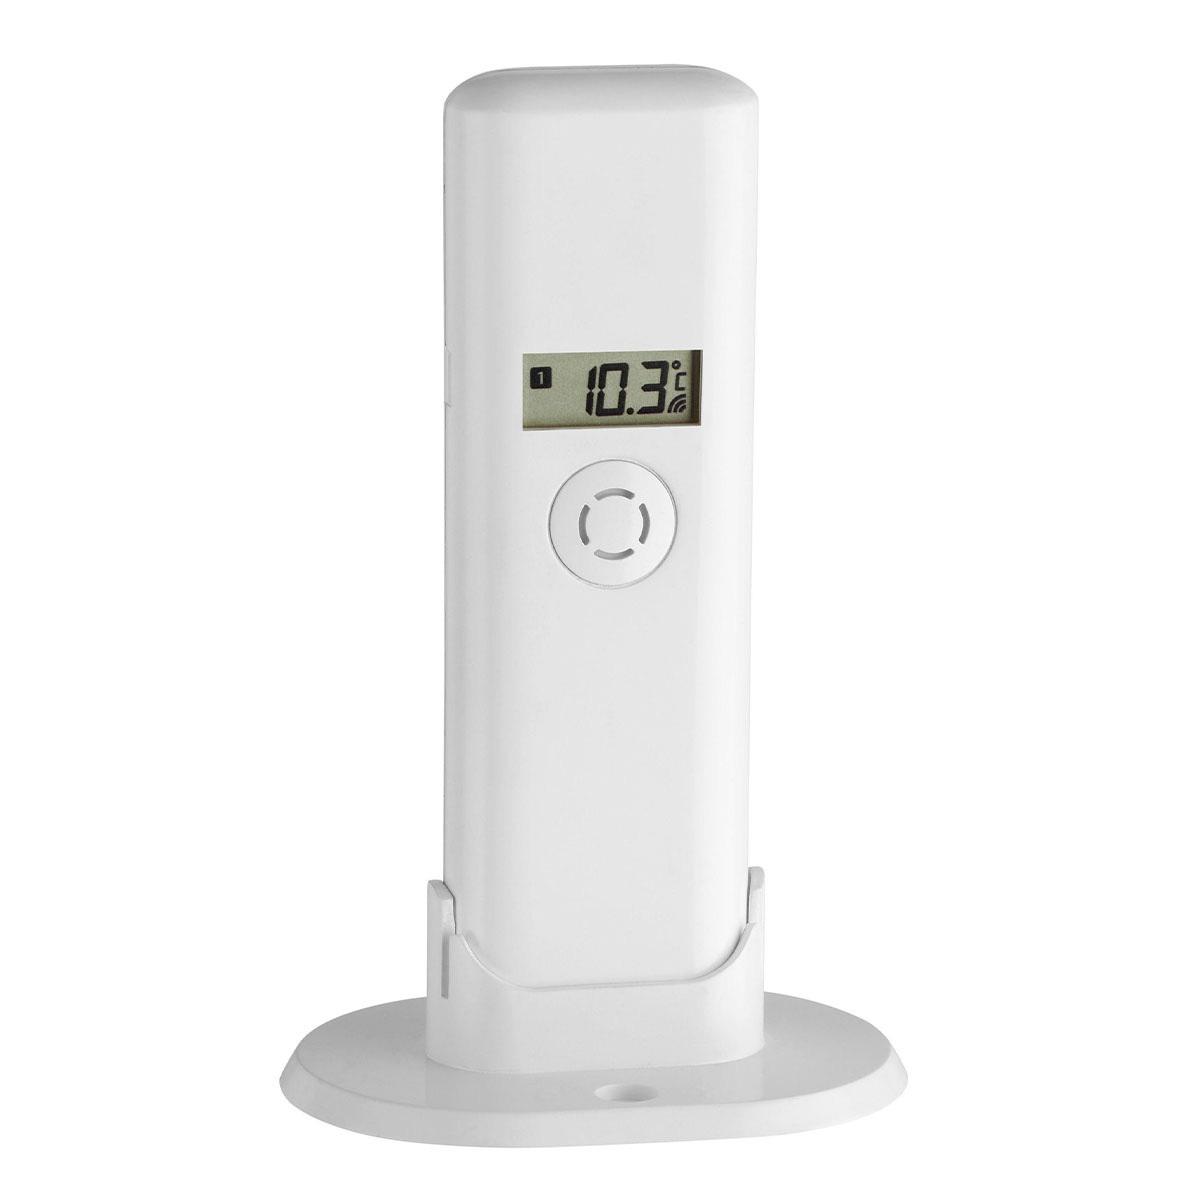 30-3018-10-it-funk-thermometer-diva-go-sender-1200x1200px.jpg